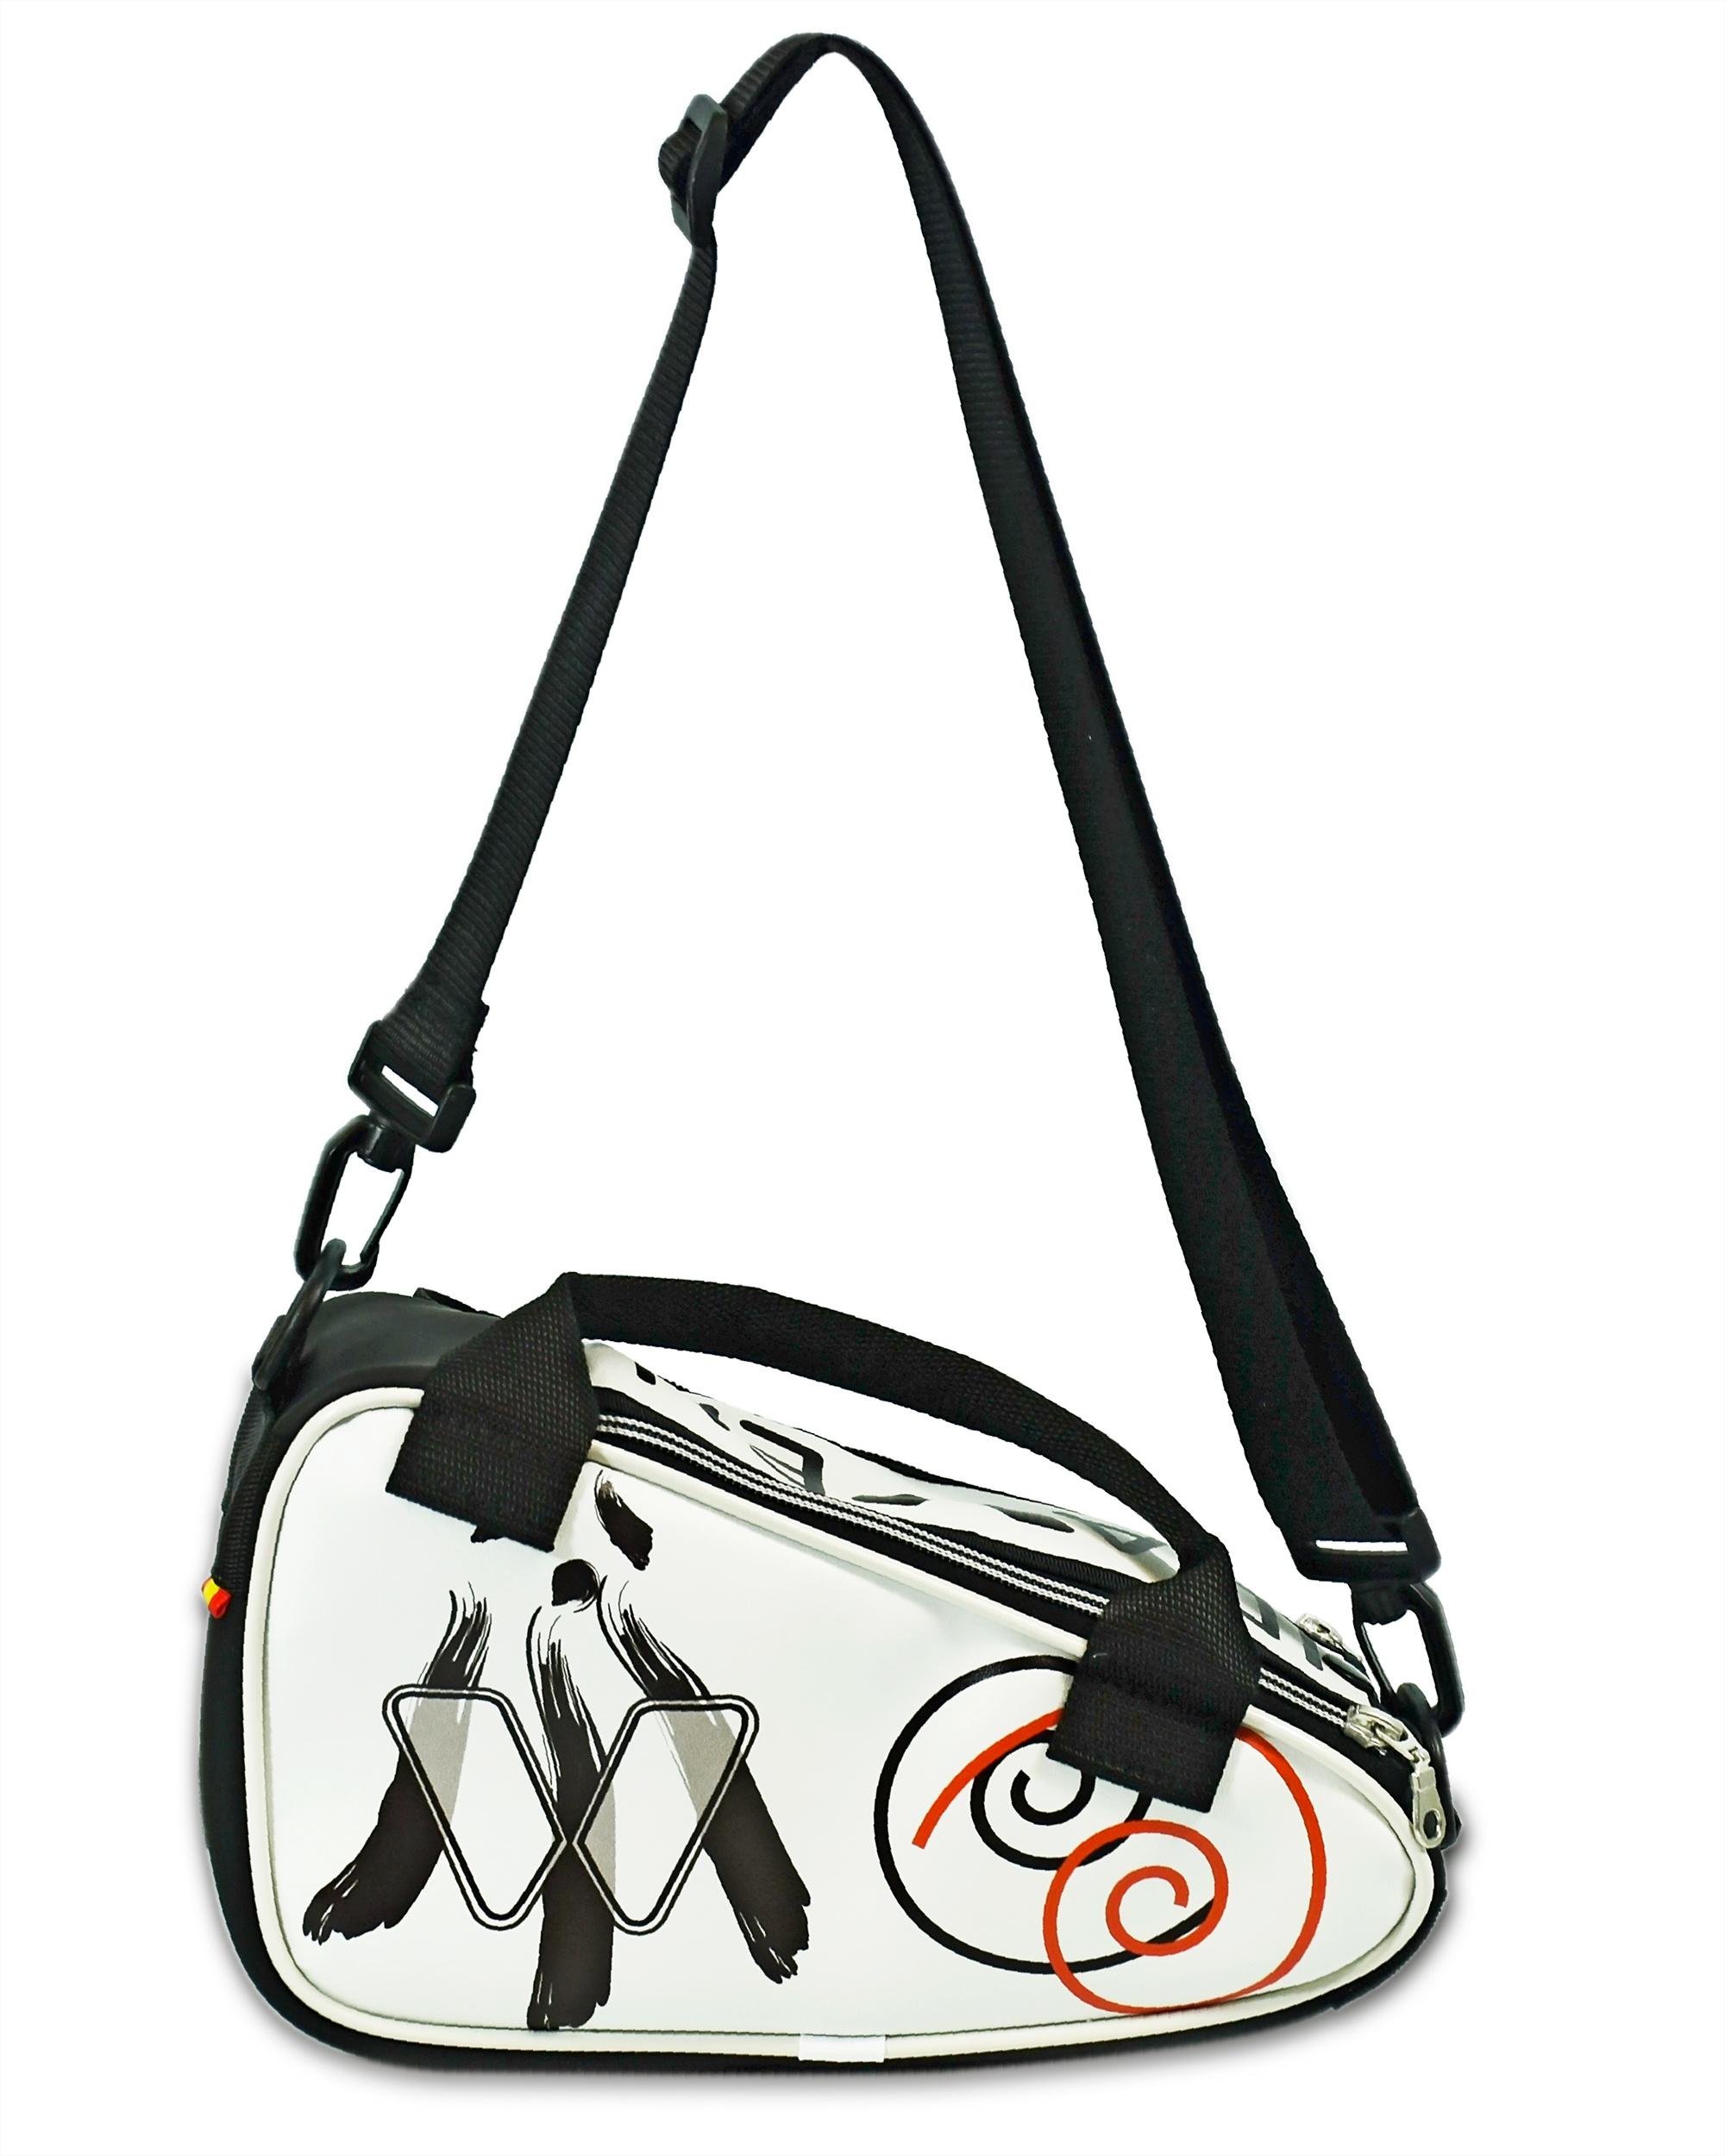 Sporty Handbag Awen Accessories Moda Athleisure